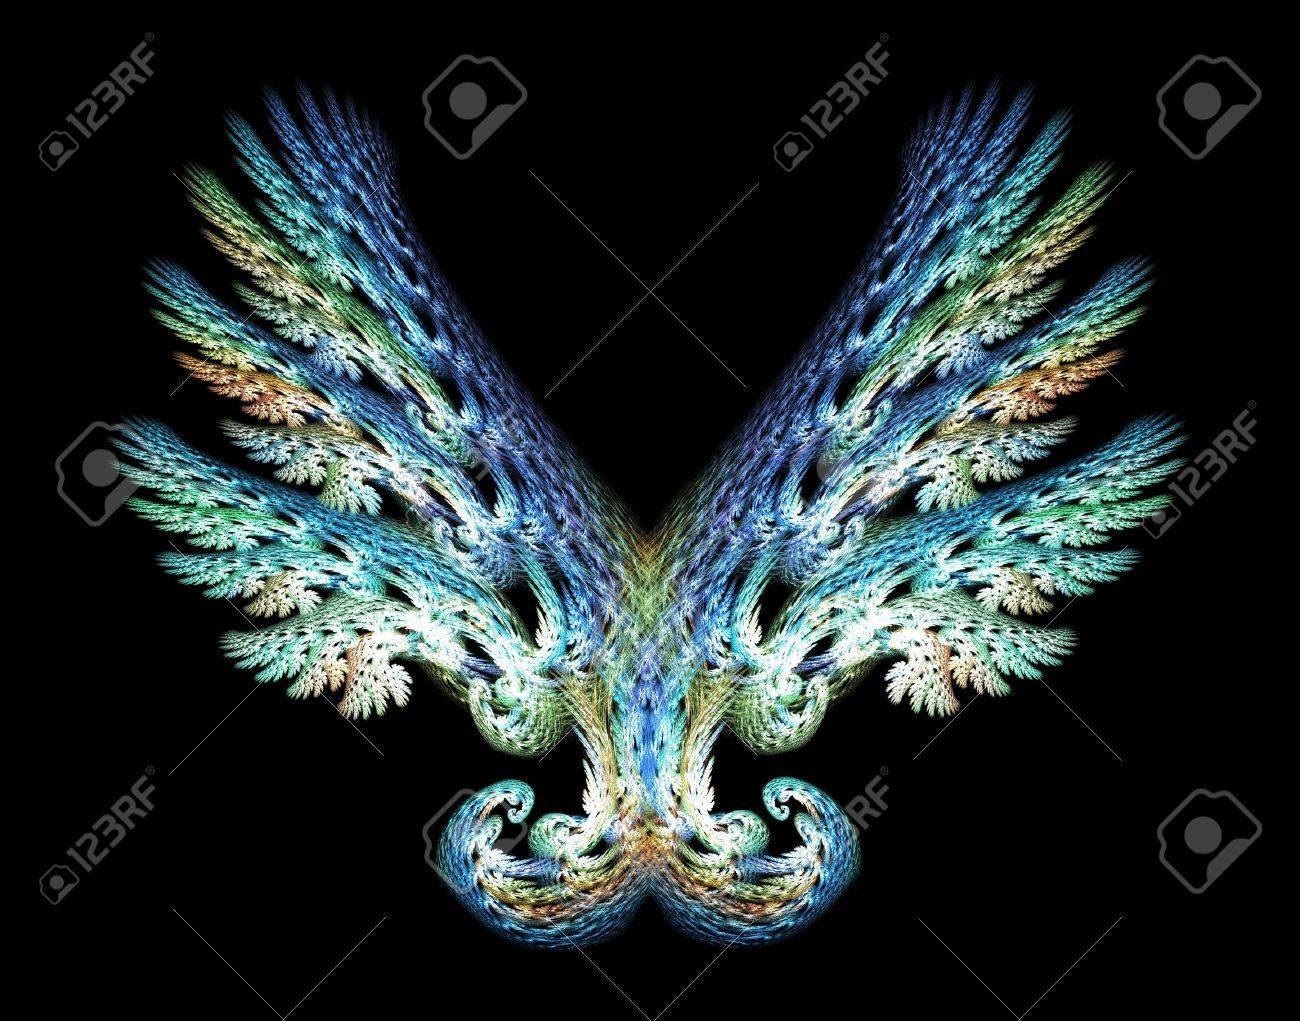 Blue Green Angel wings fractal emblem over black background. Stock Photo - 5150106